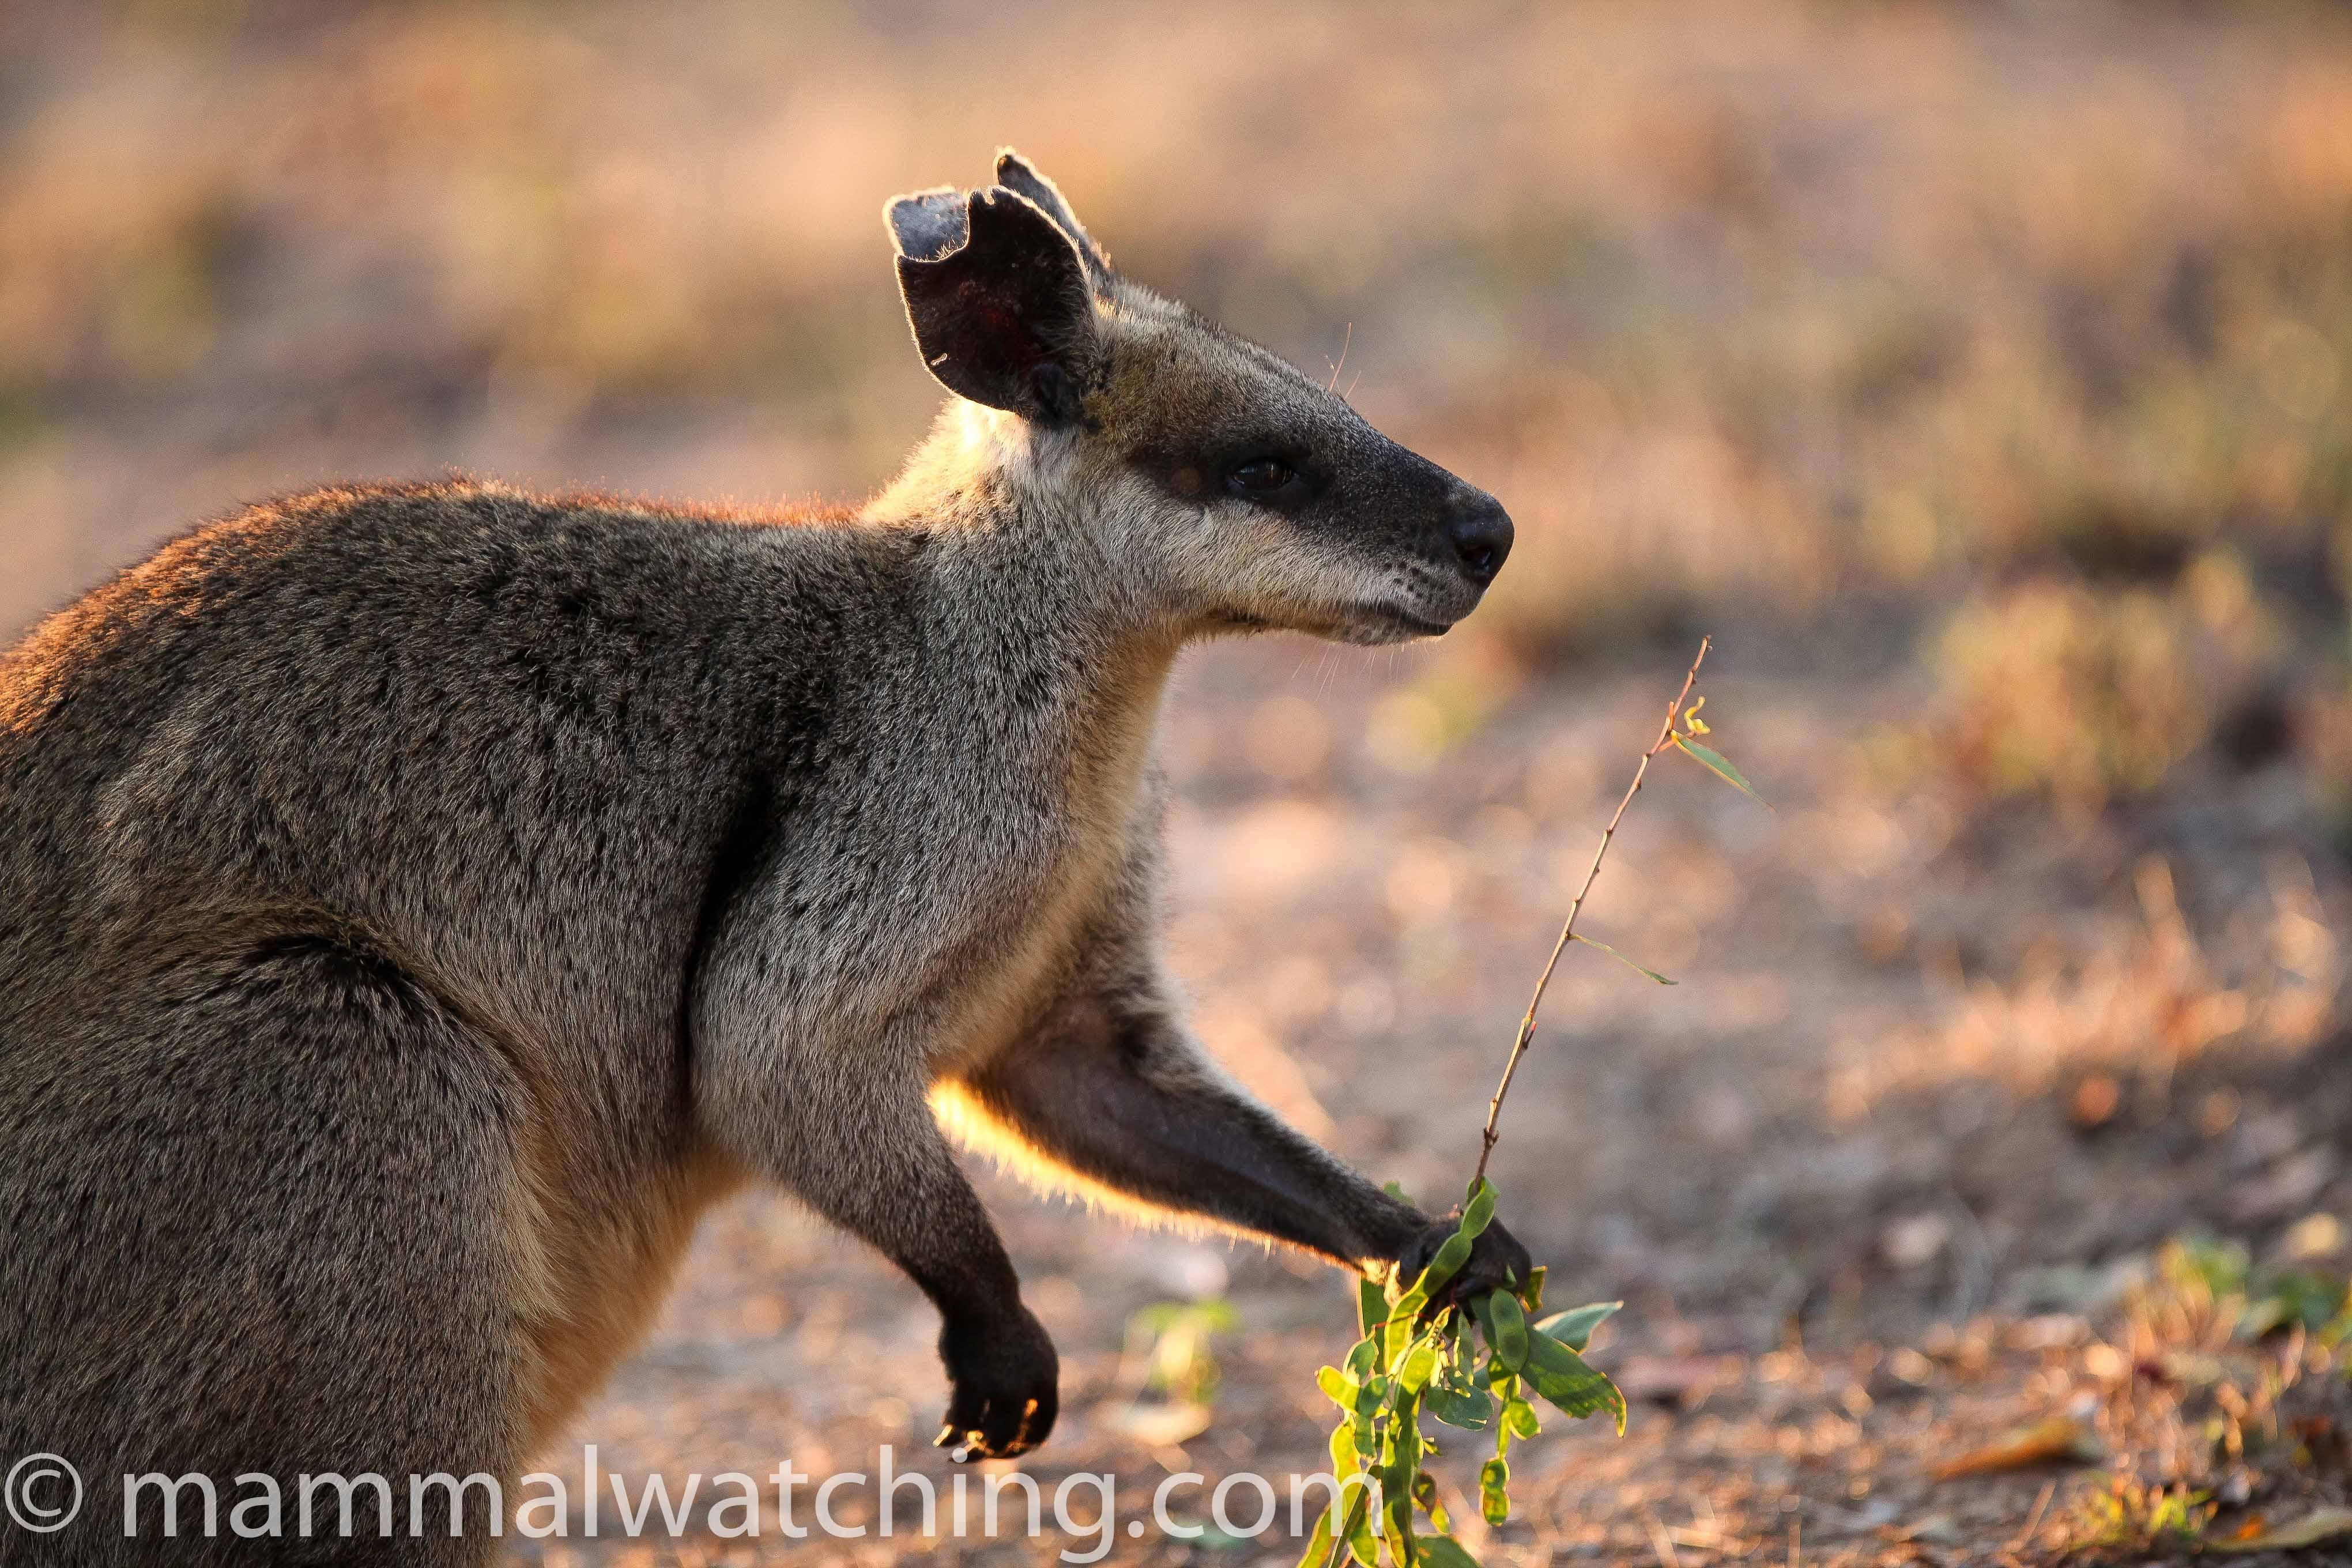 Queensland Mammal Watching